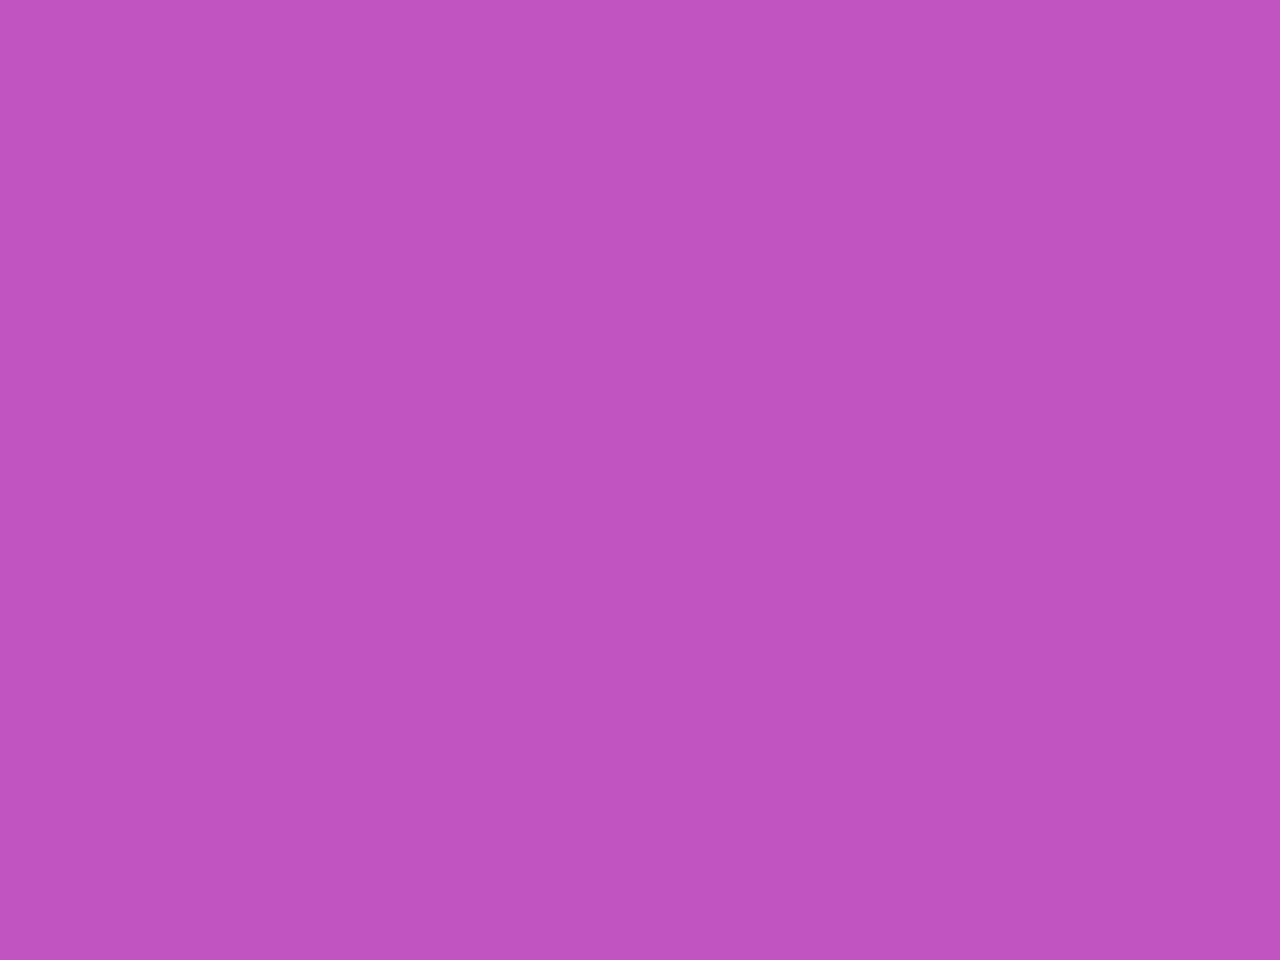 1280x960 Fuchsia Crayola Solid Color Background